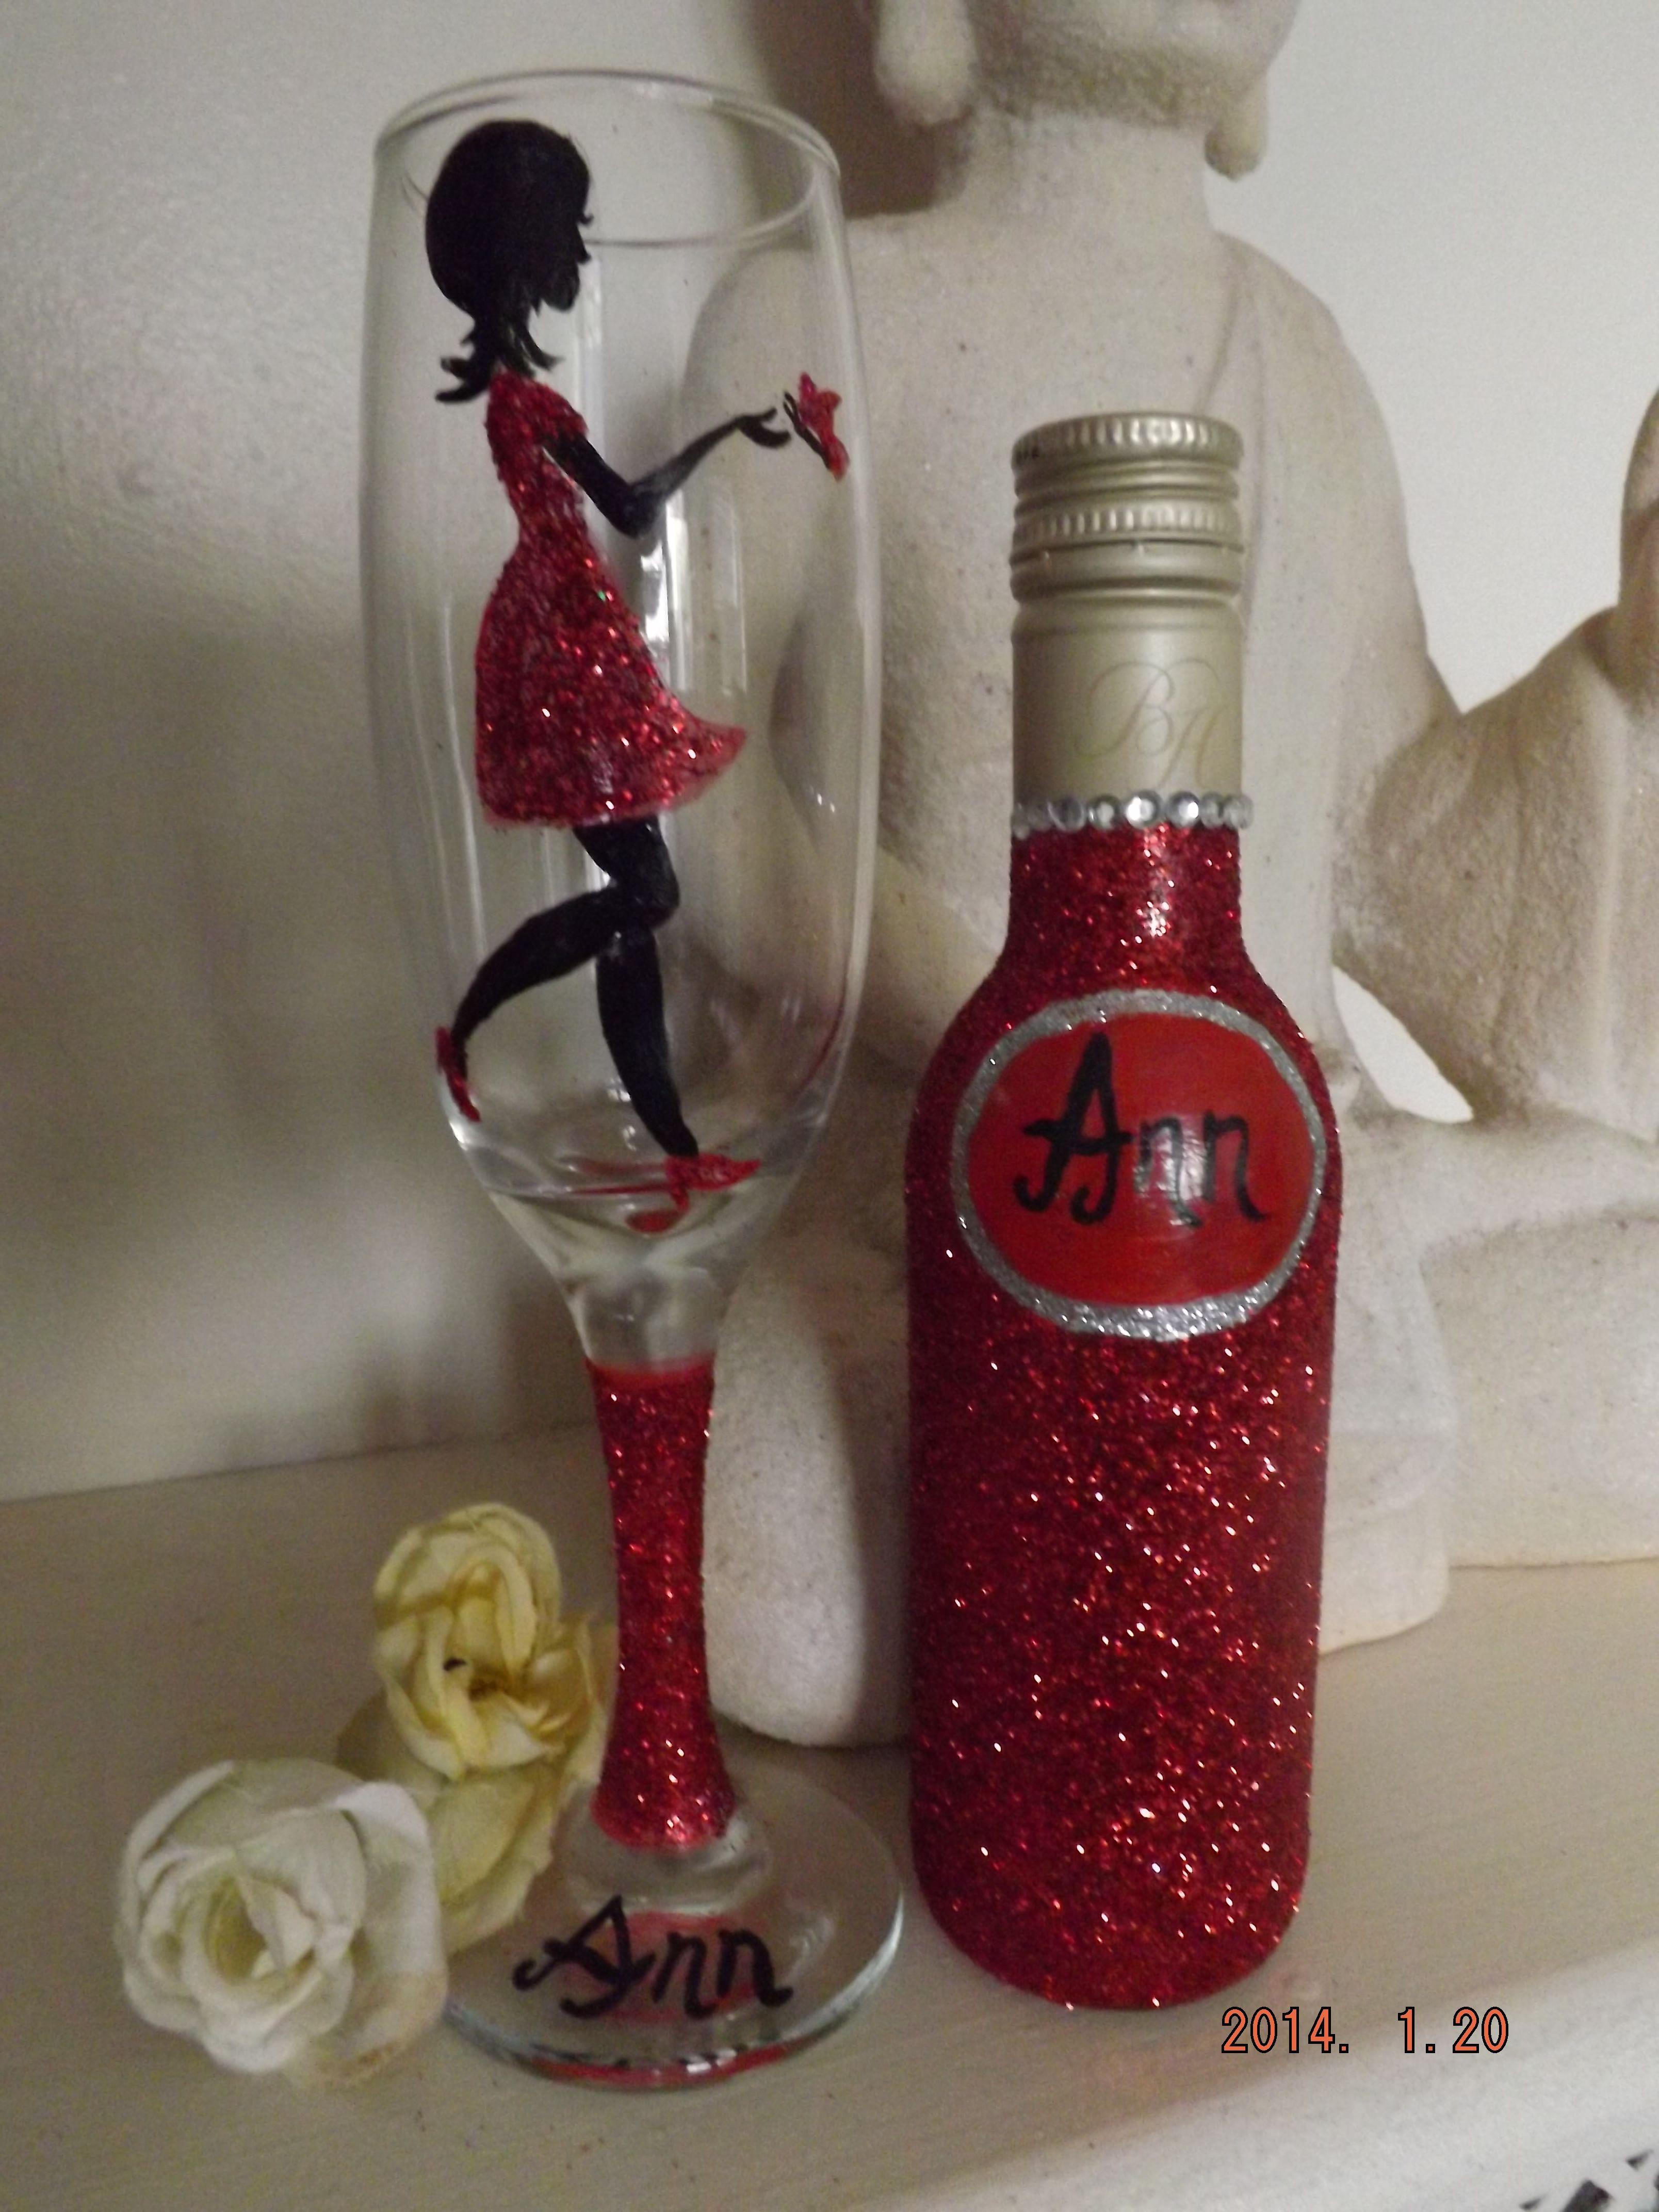 Dazzle Glass Uk Birthday Wine Glass And Small Bottle Of Wine Personalized Glassware Birthday Wine Glass Bottles Decoration